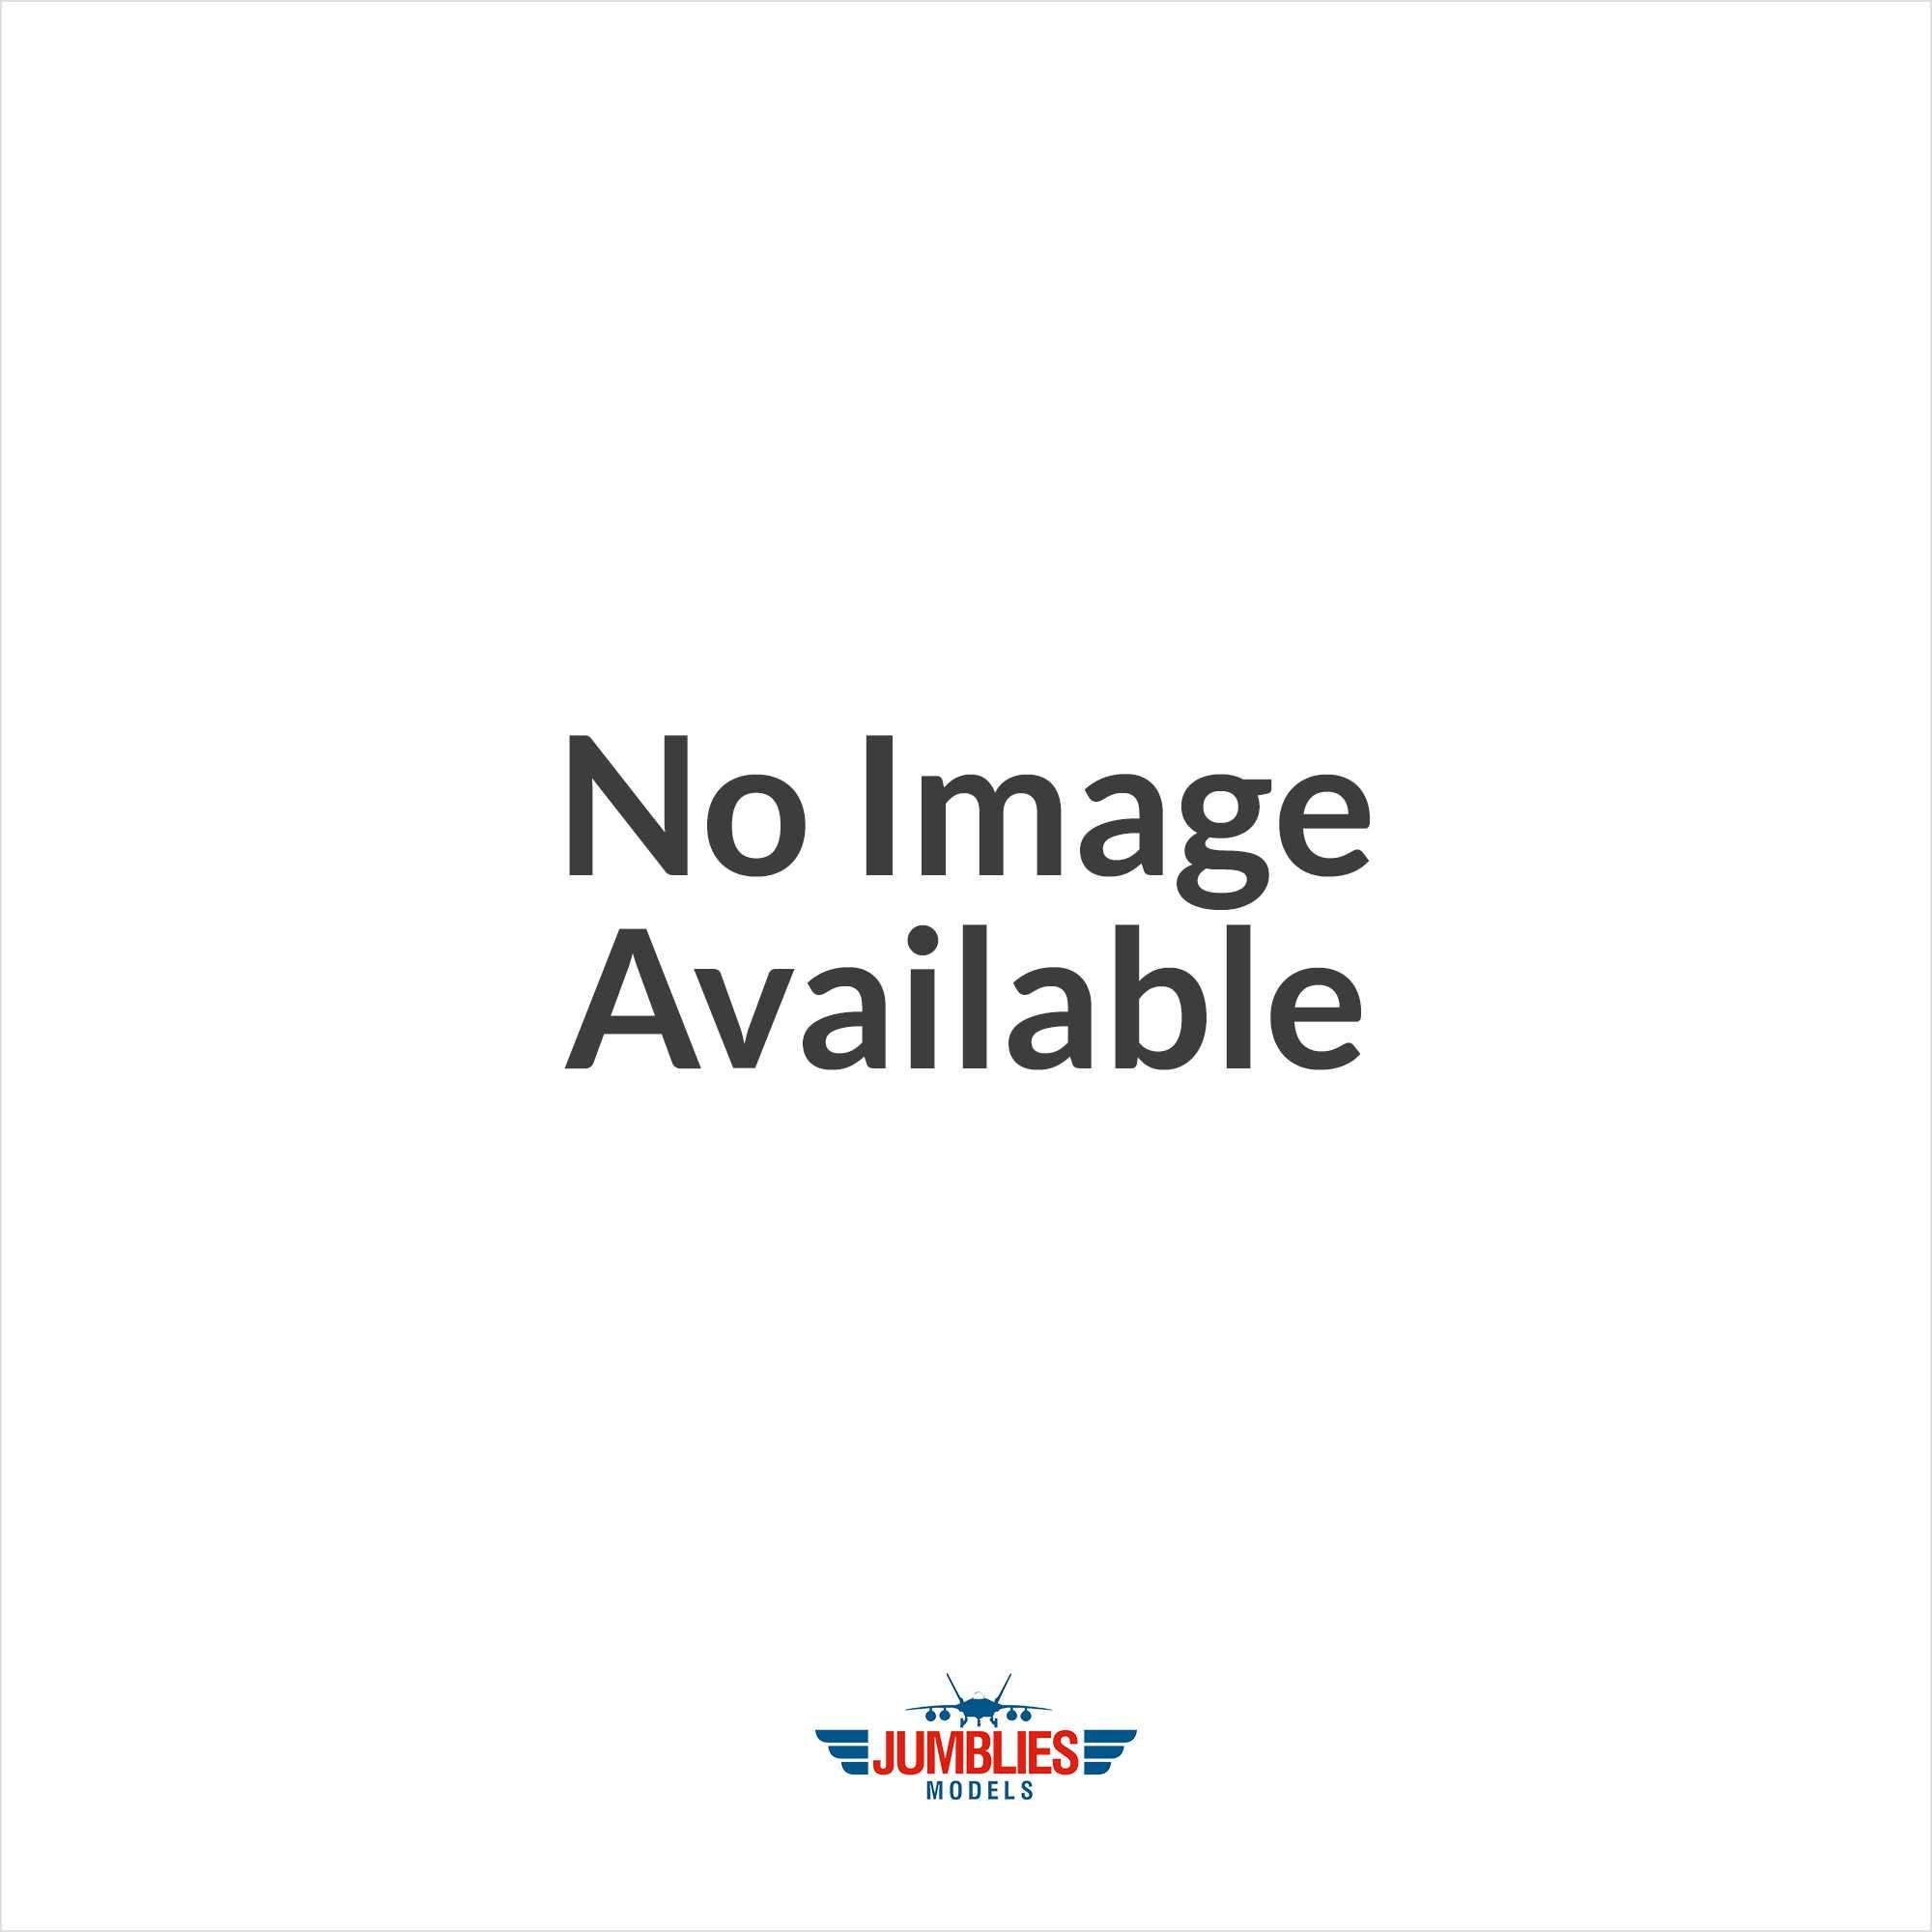 Moebius Models International ProStar - 1:25 Scale Truck Kit